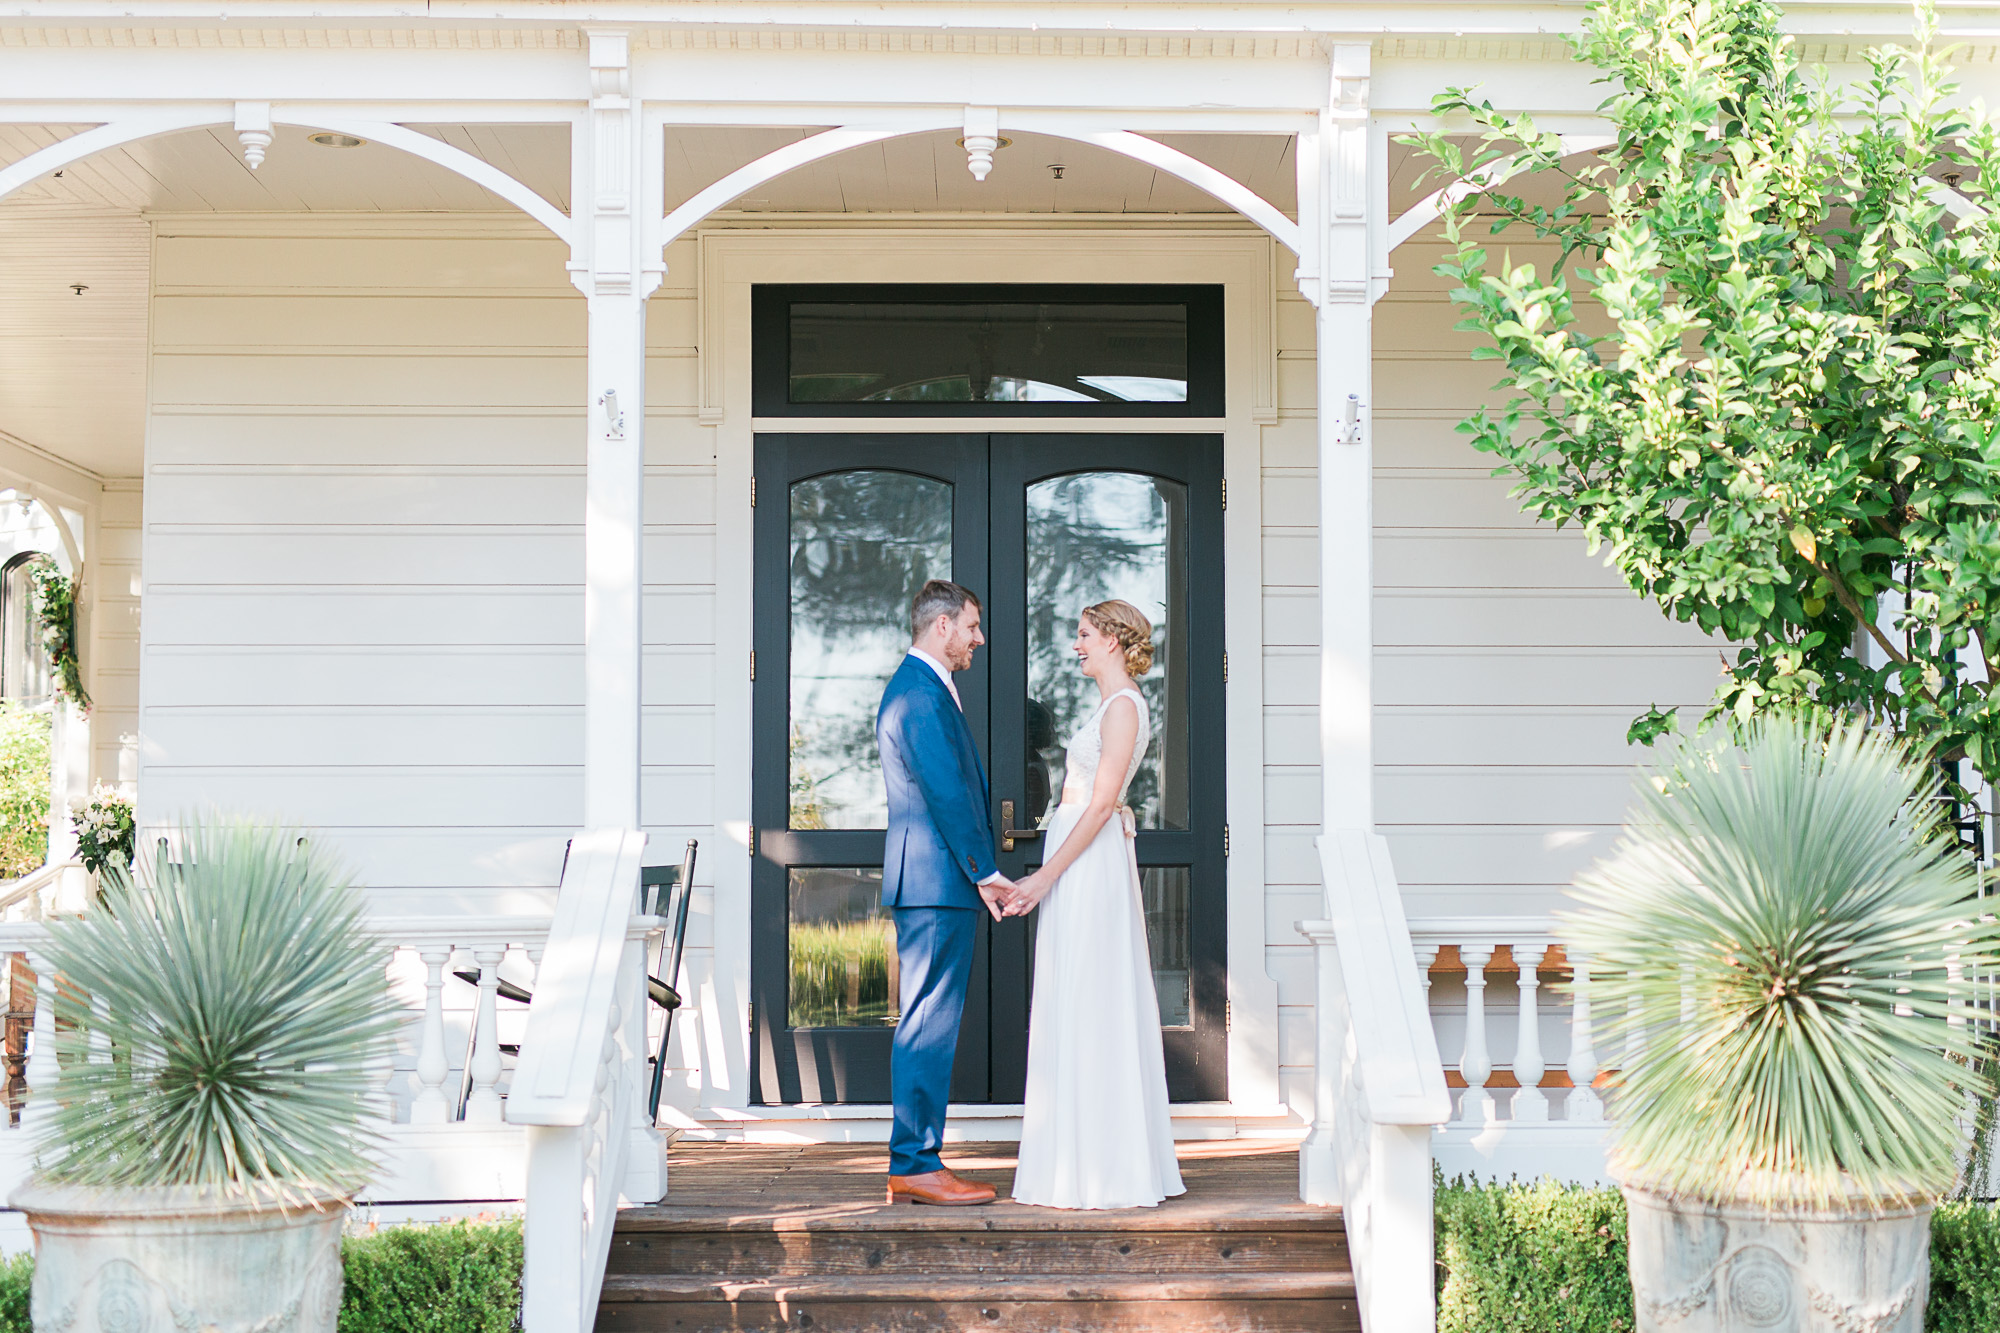 Generals Daughter Wedding Photos by JBJ Pictures - Ramekins Wedding Venue Photographer in Sonoma, Napa (9).jpg